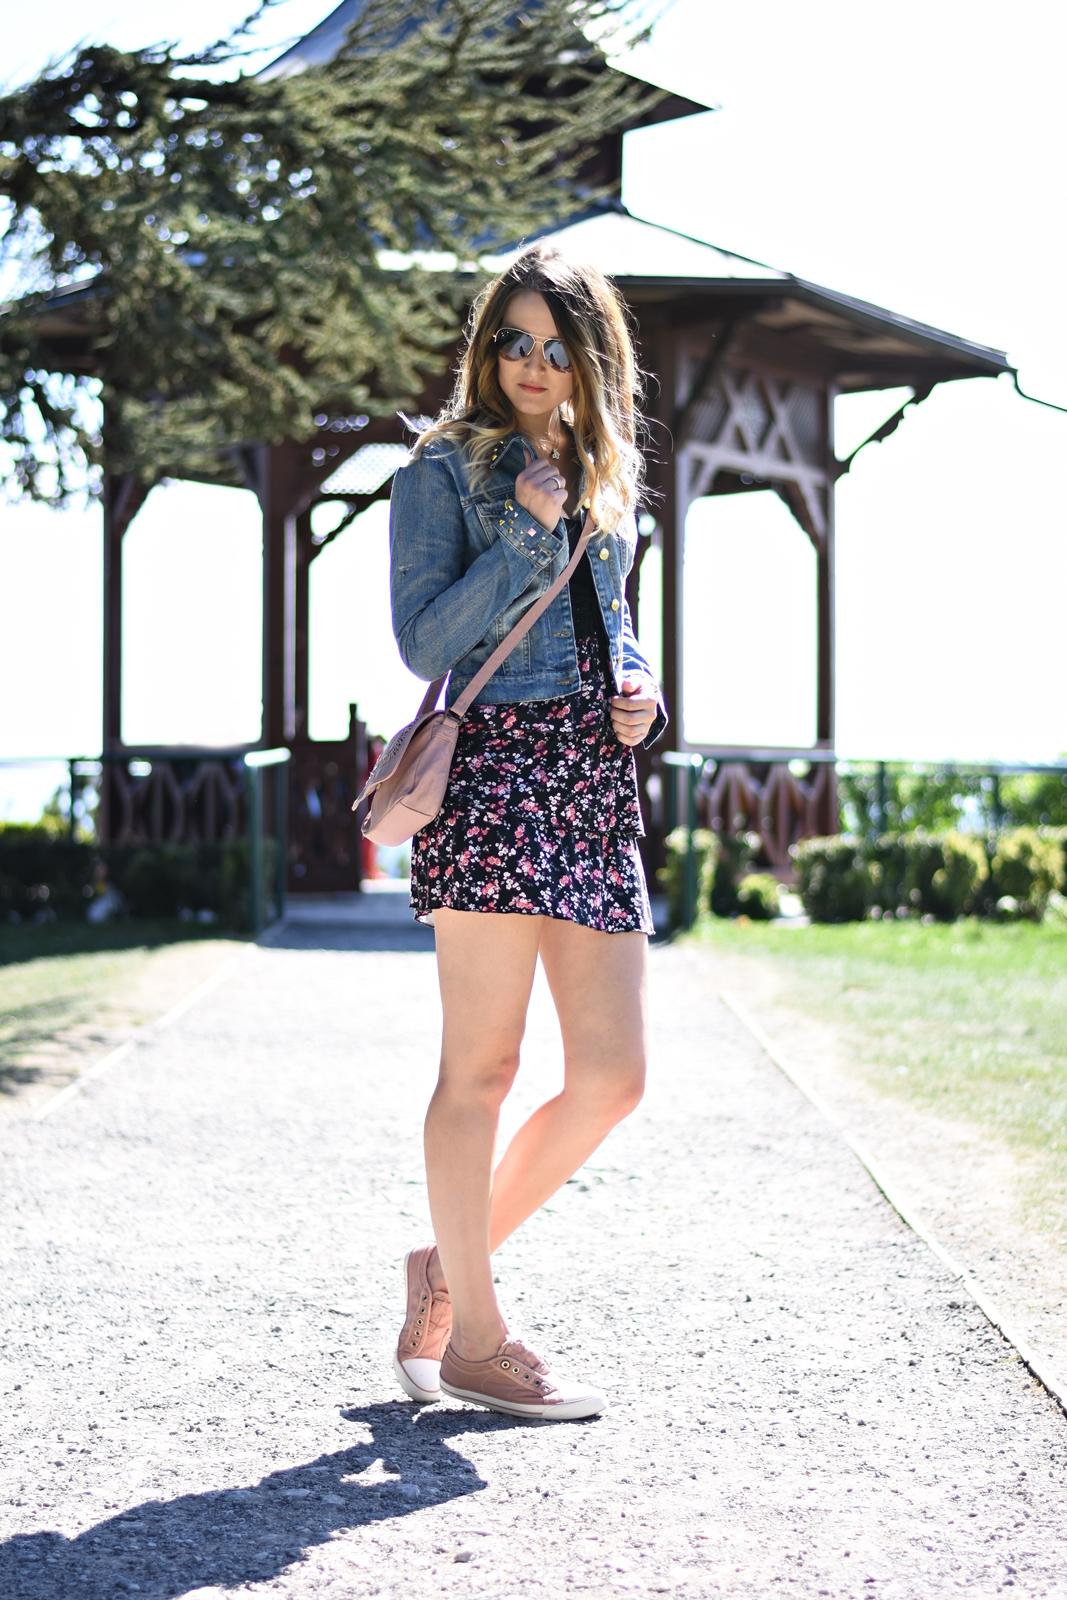 Denim Love - Jeansjacke trifft Blumenkleid - Outfit - Frühlingslook - Fashionladyloves